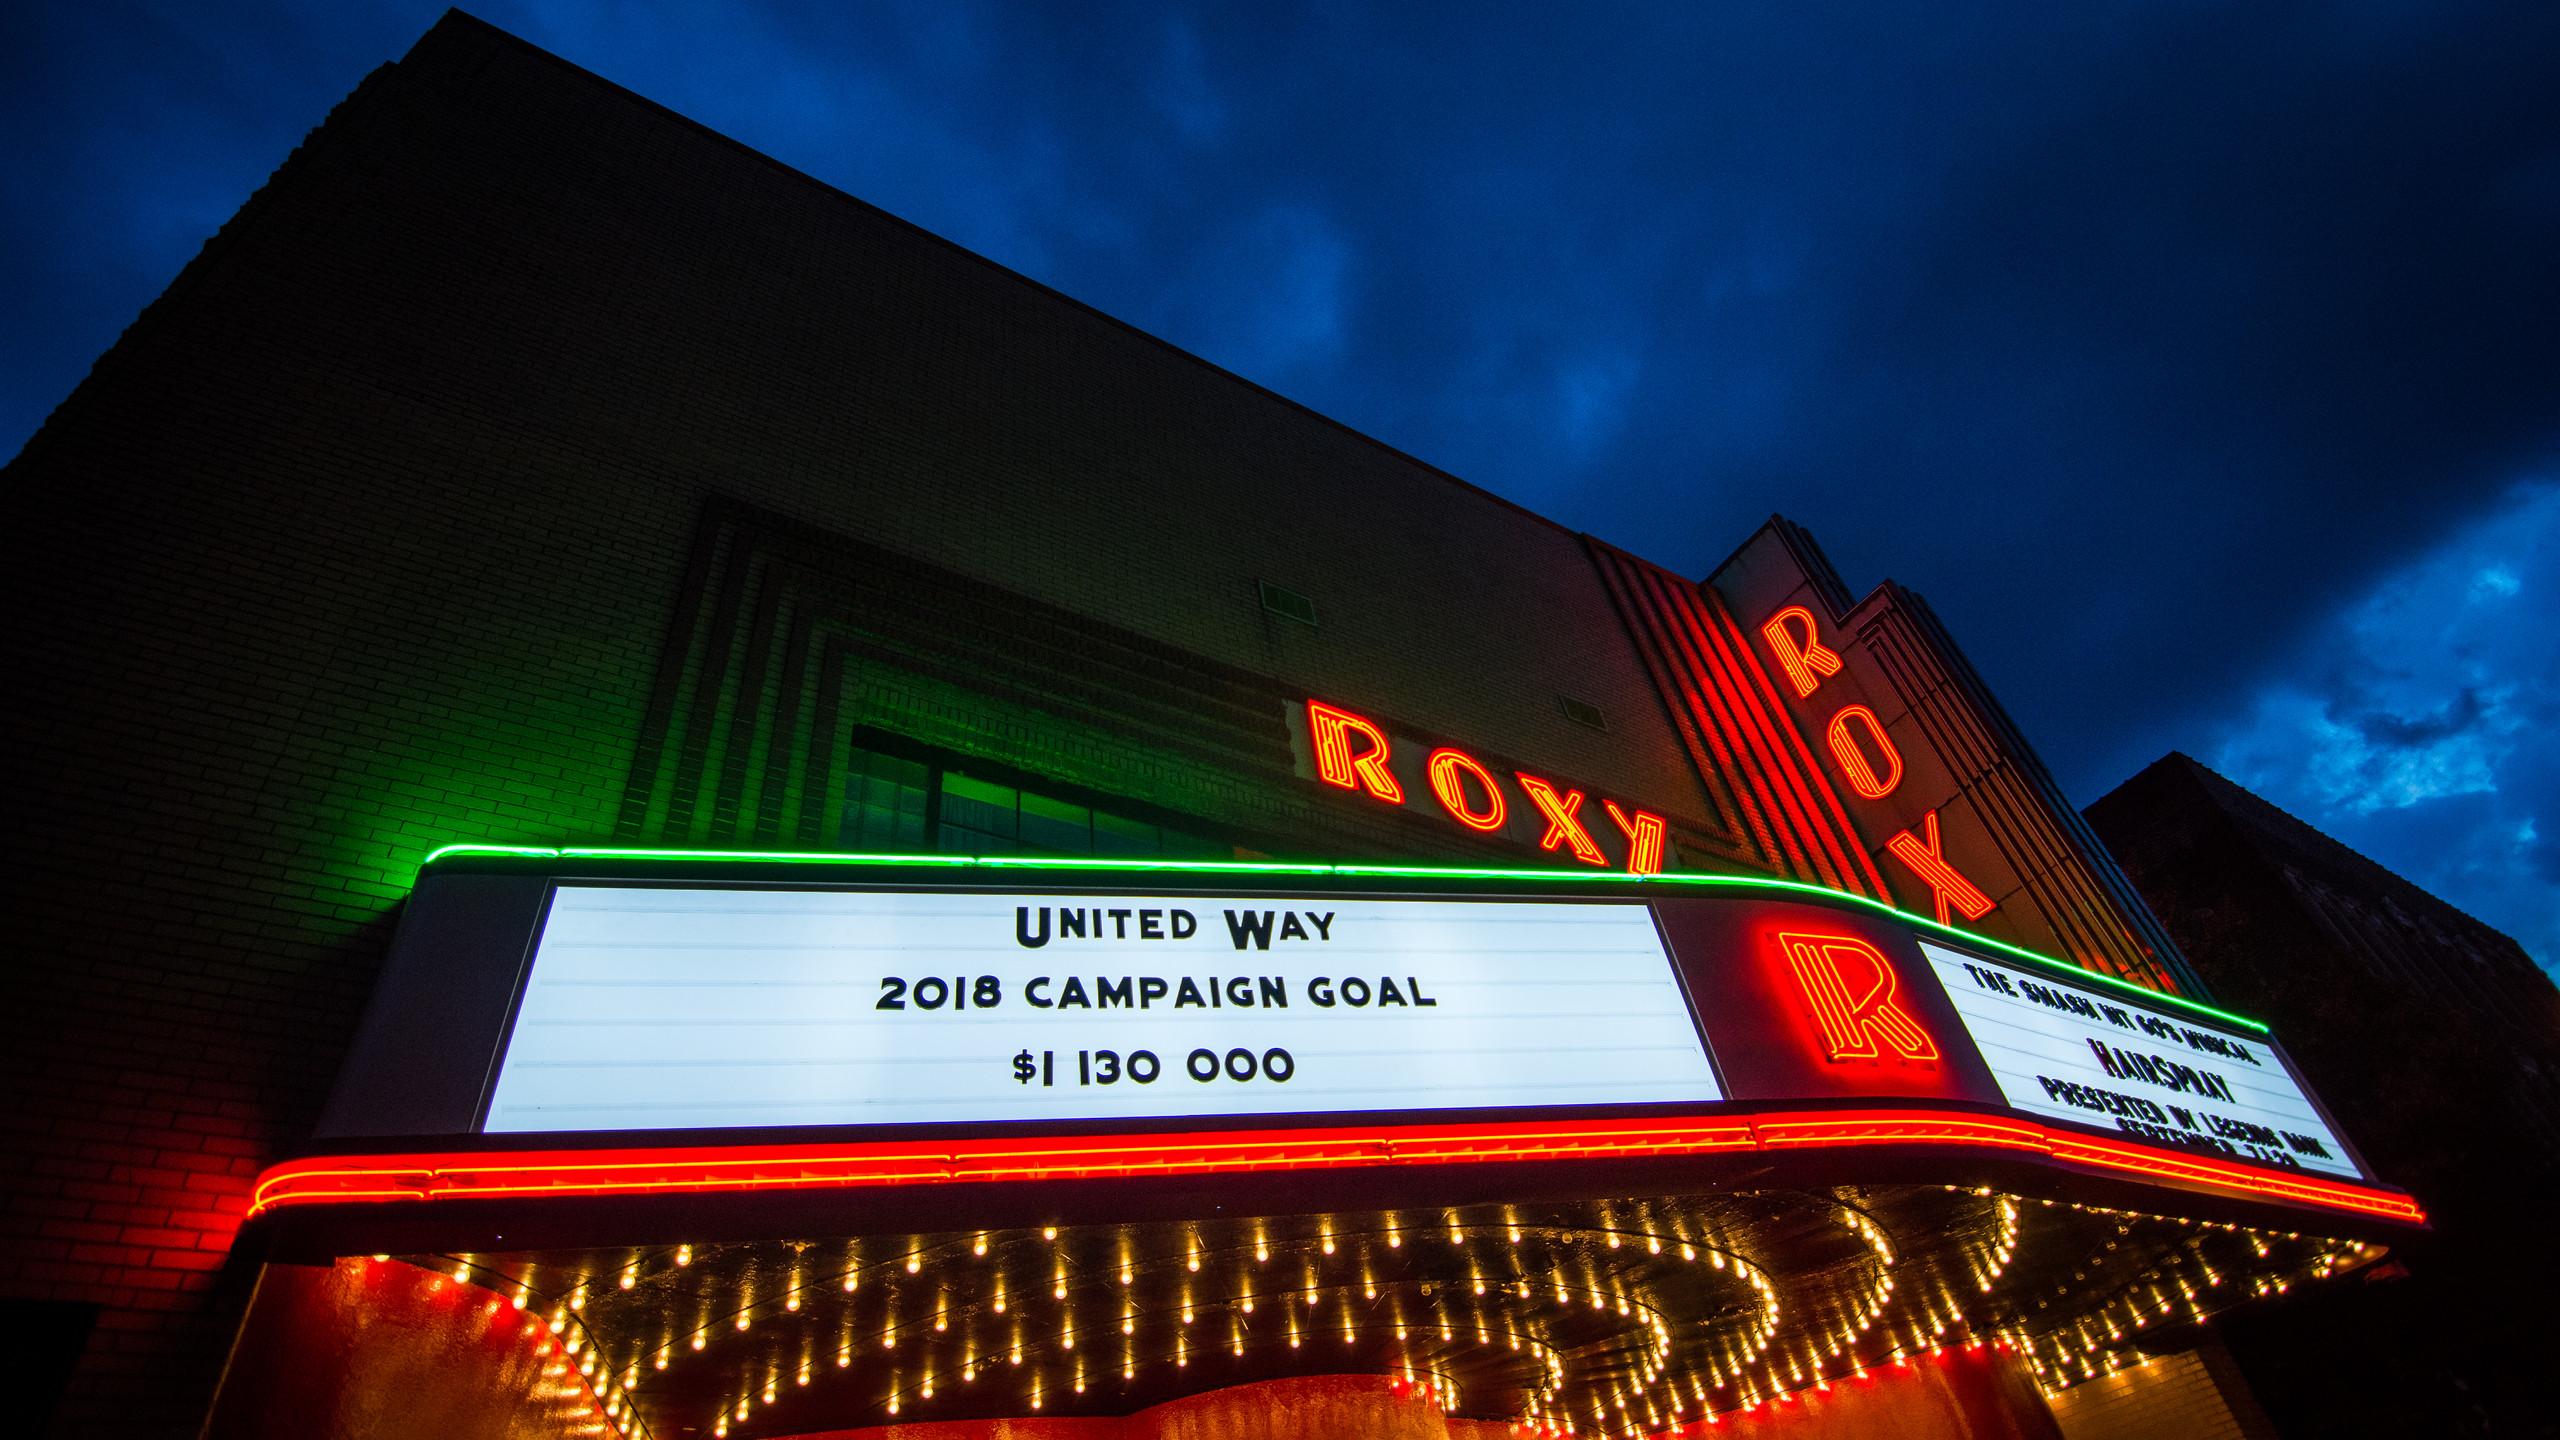 Roxy_United Way